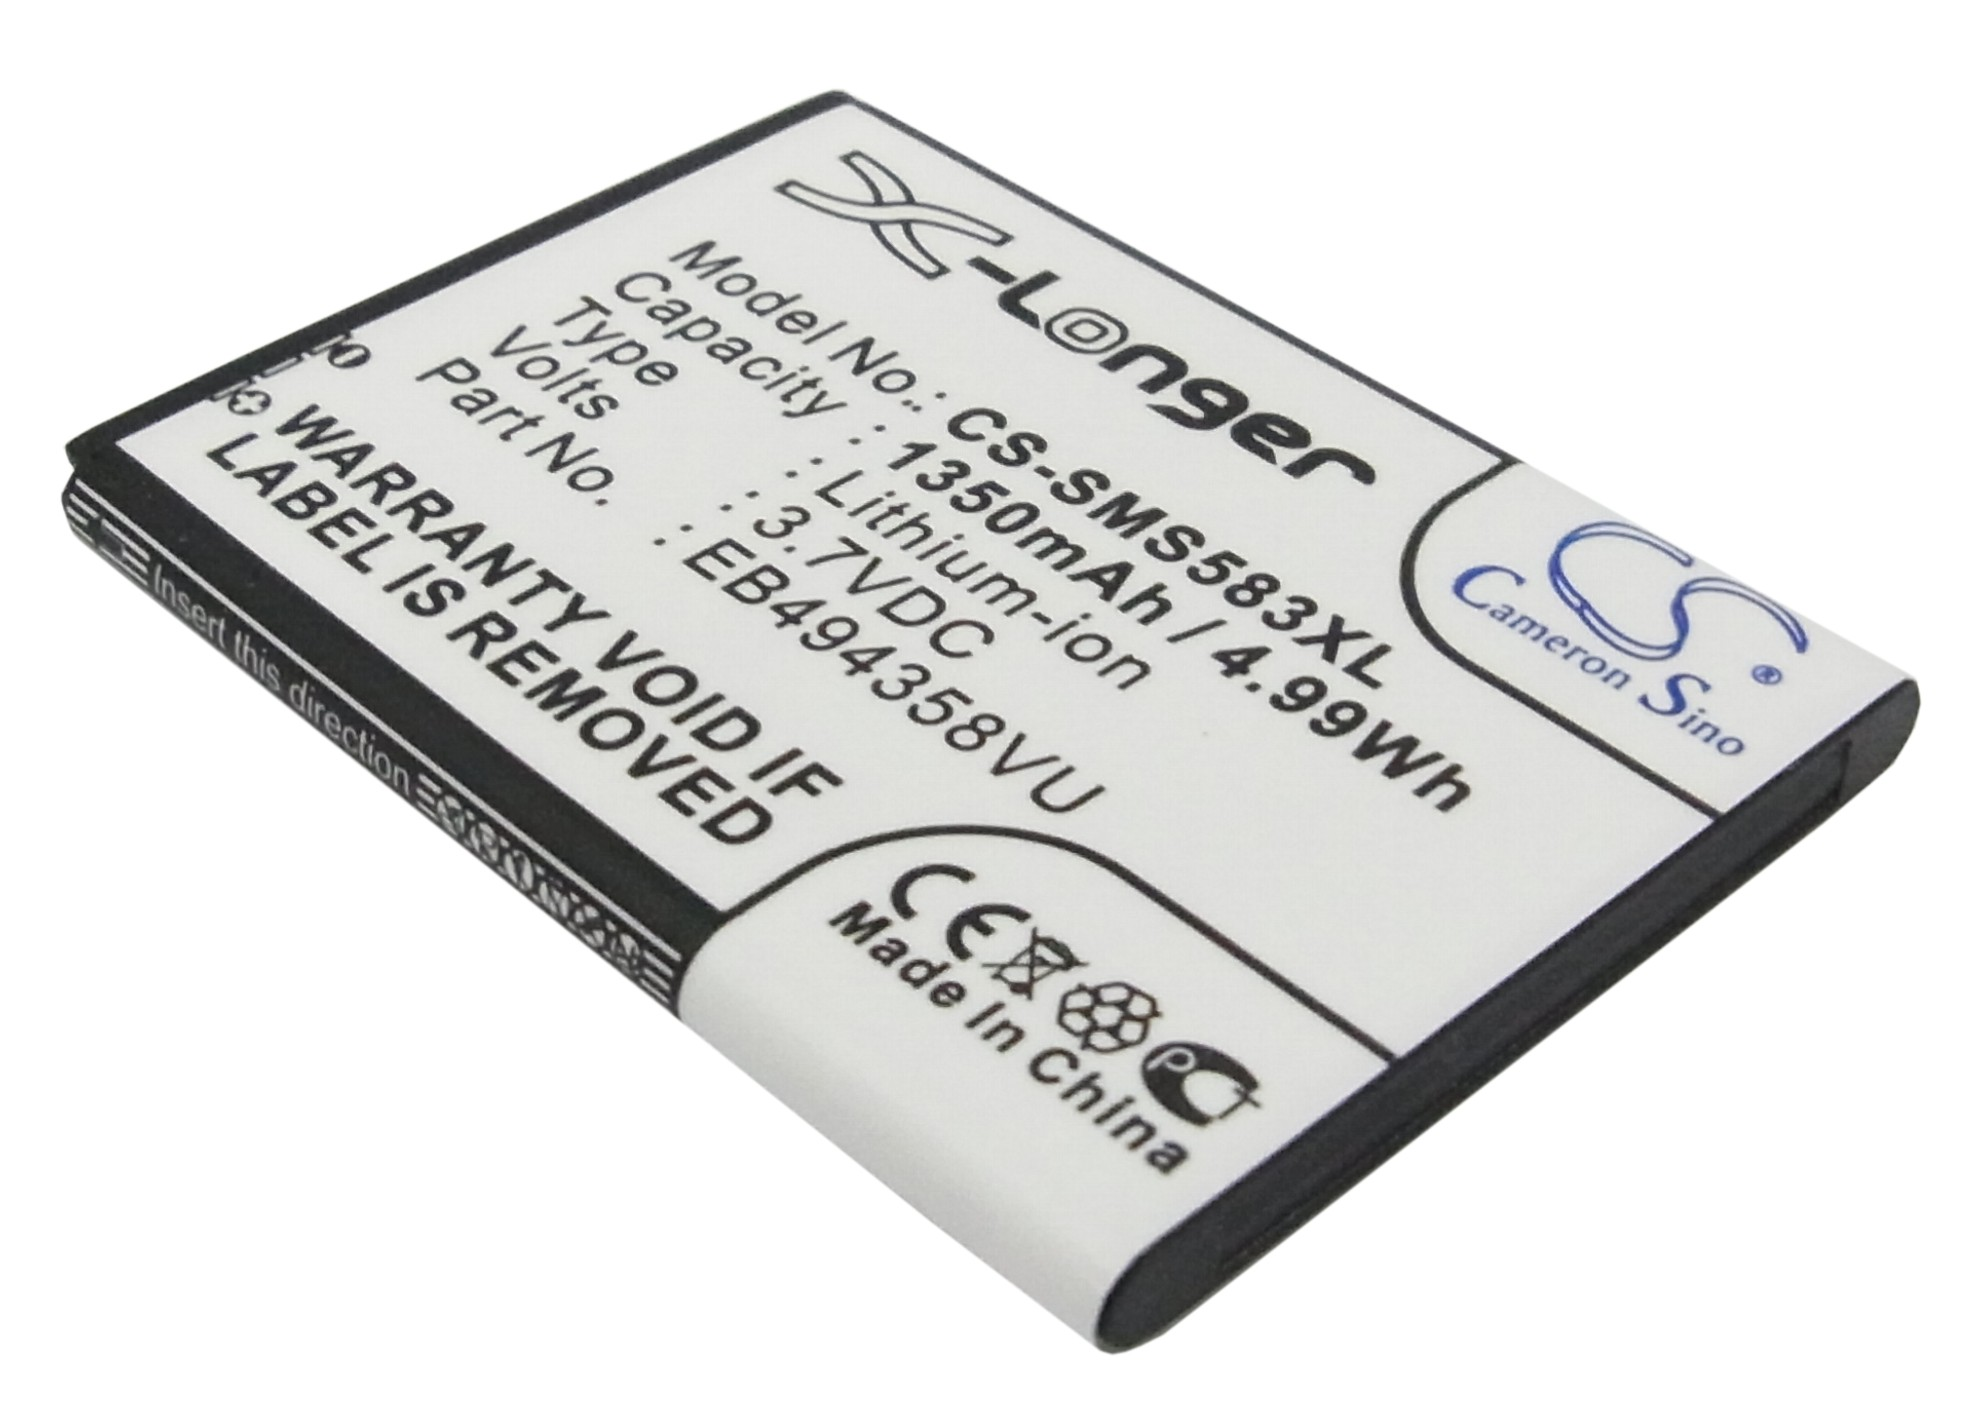 Cameron Sino baterie do mobilů pro SAMSUNG GT-S5830 3.7V Li-ion 1350mAh černá - neoriginální